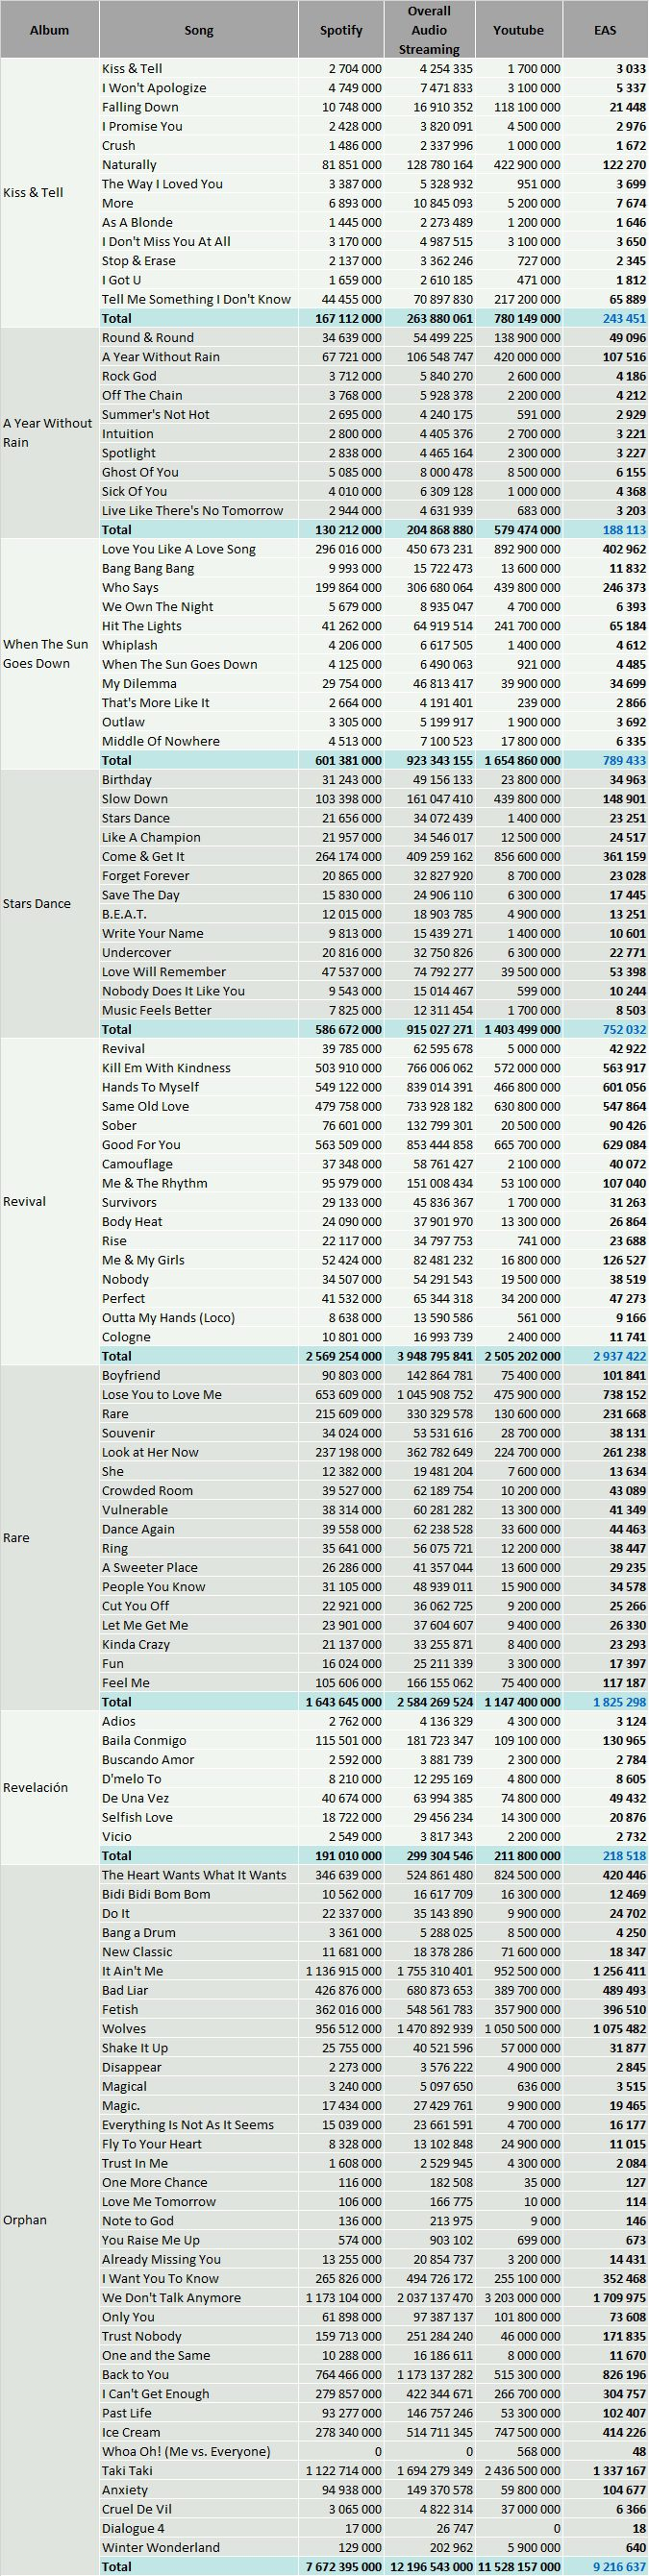 CSPC Selena Gomez full discography streaming